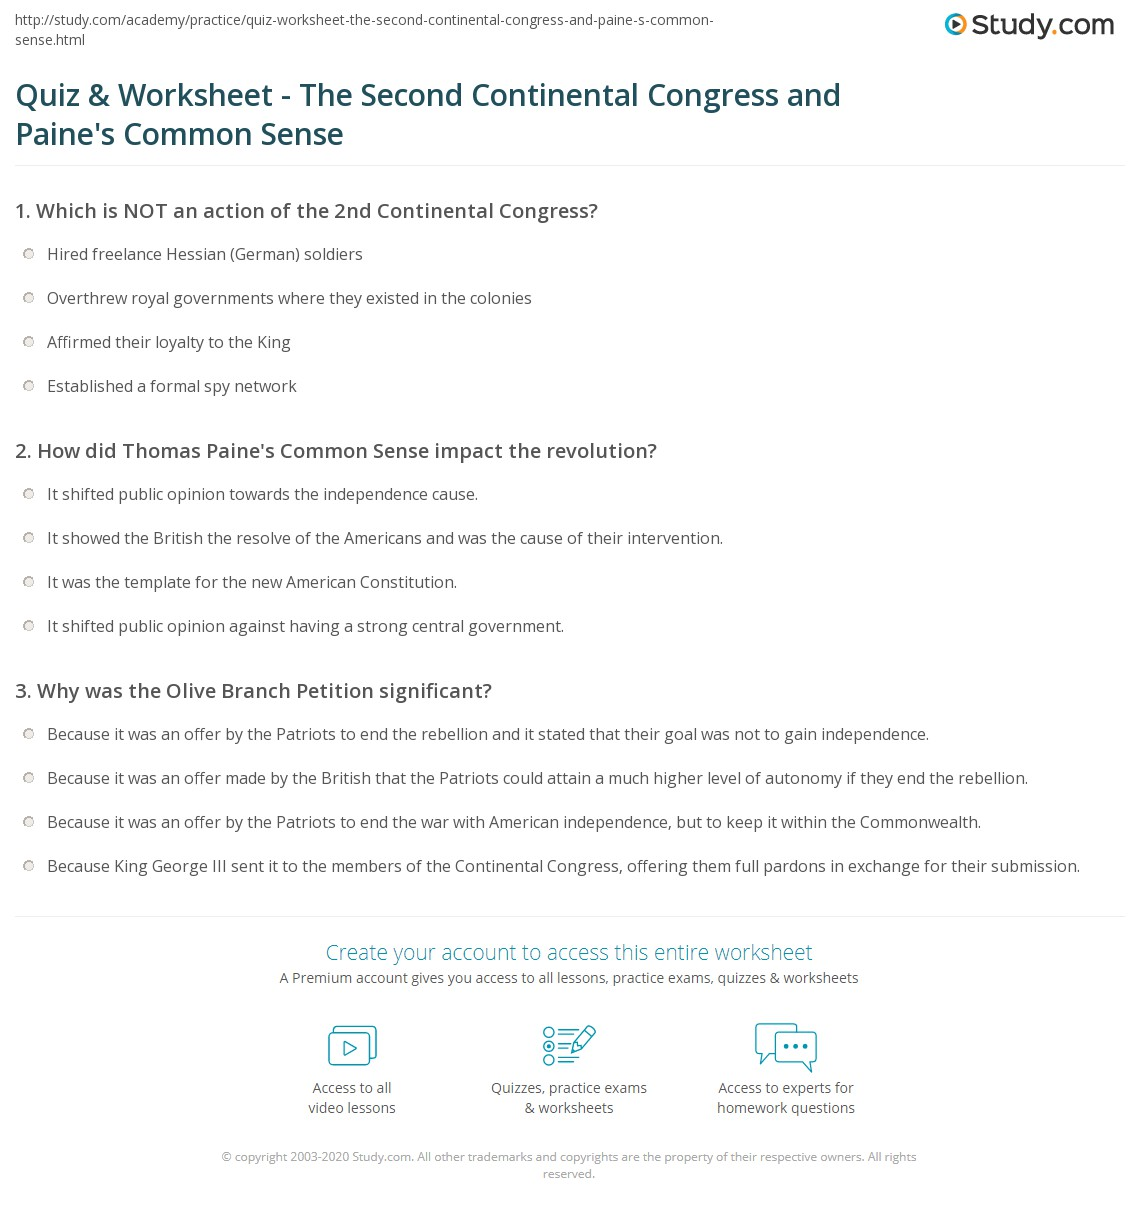 Worksheet Common Sense Tractor